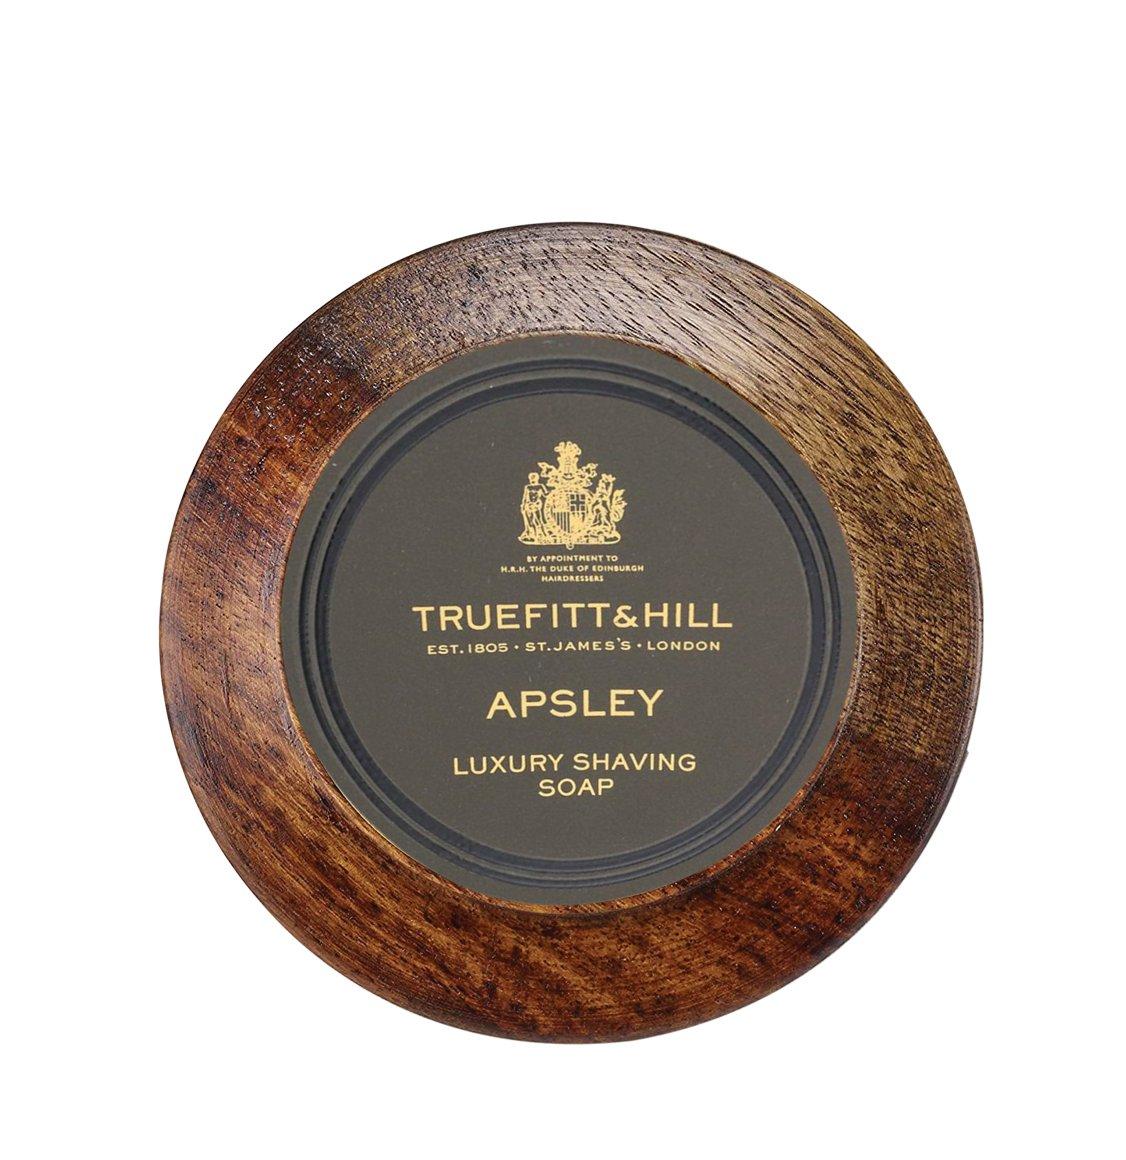 Truefitt And Hill Apsley Shaving Soap In Wooden Bowl 99g